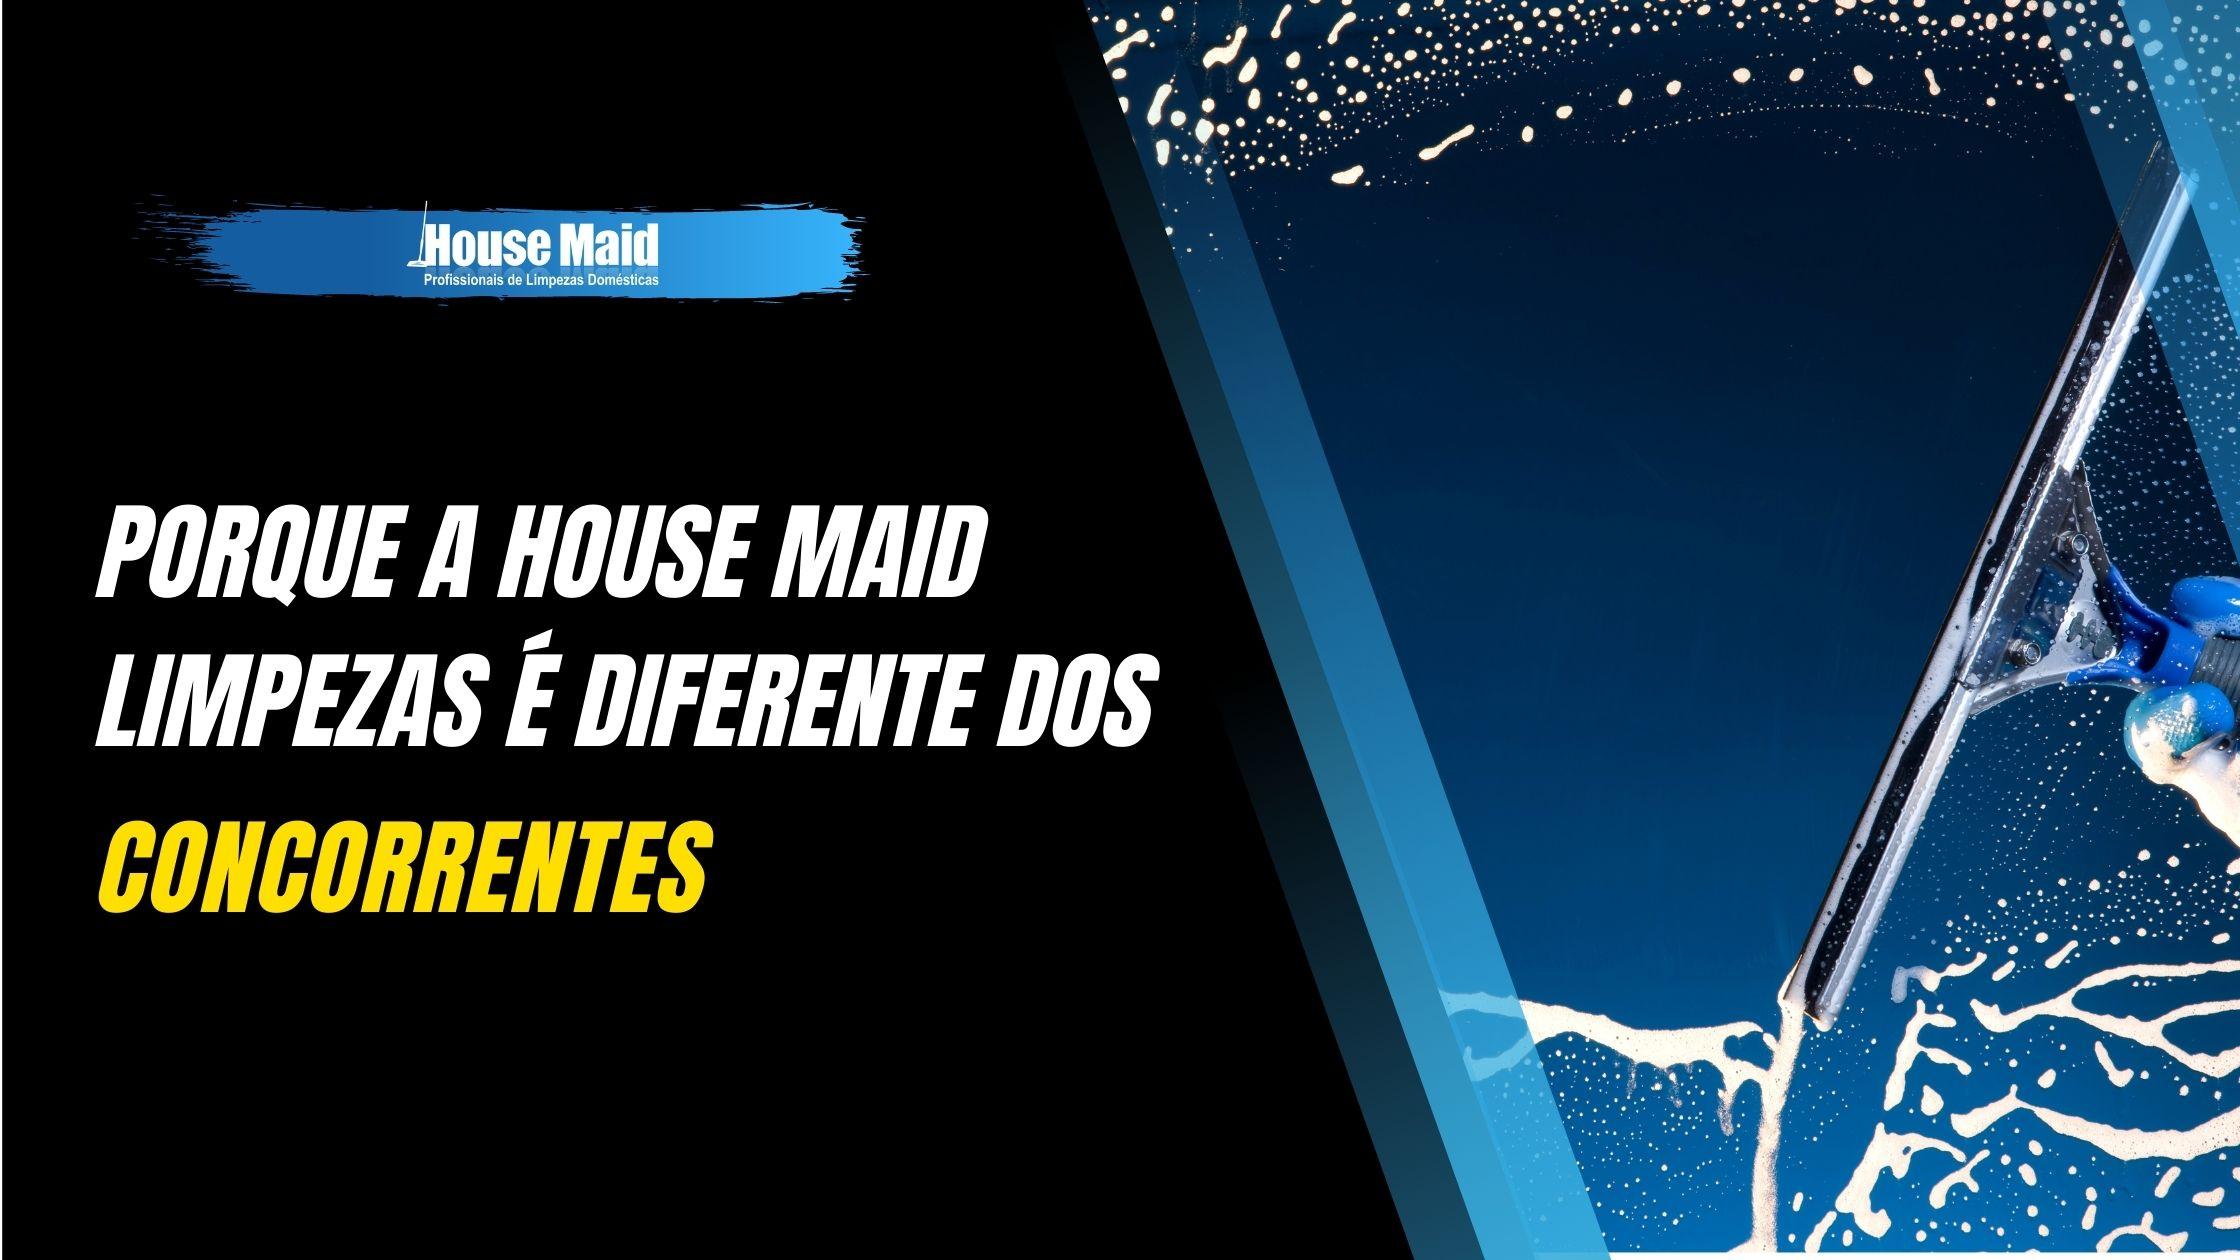 Terceirizar a Limpeza? Porque a House Maid é diferente da concorrência?